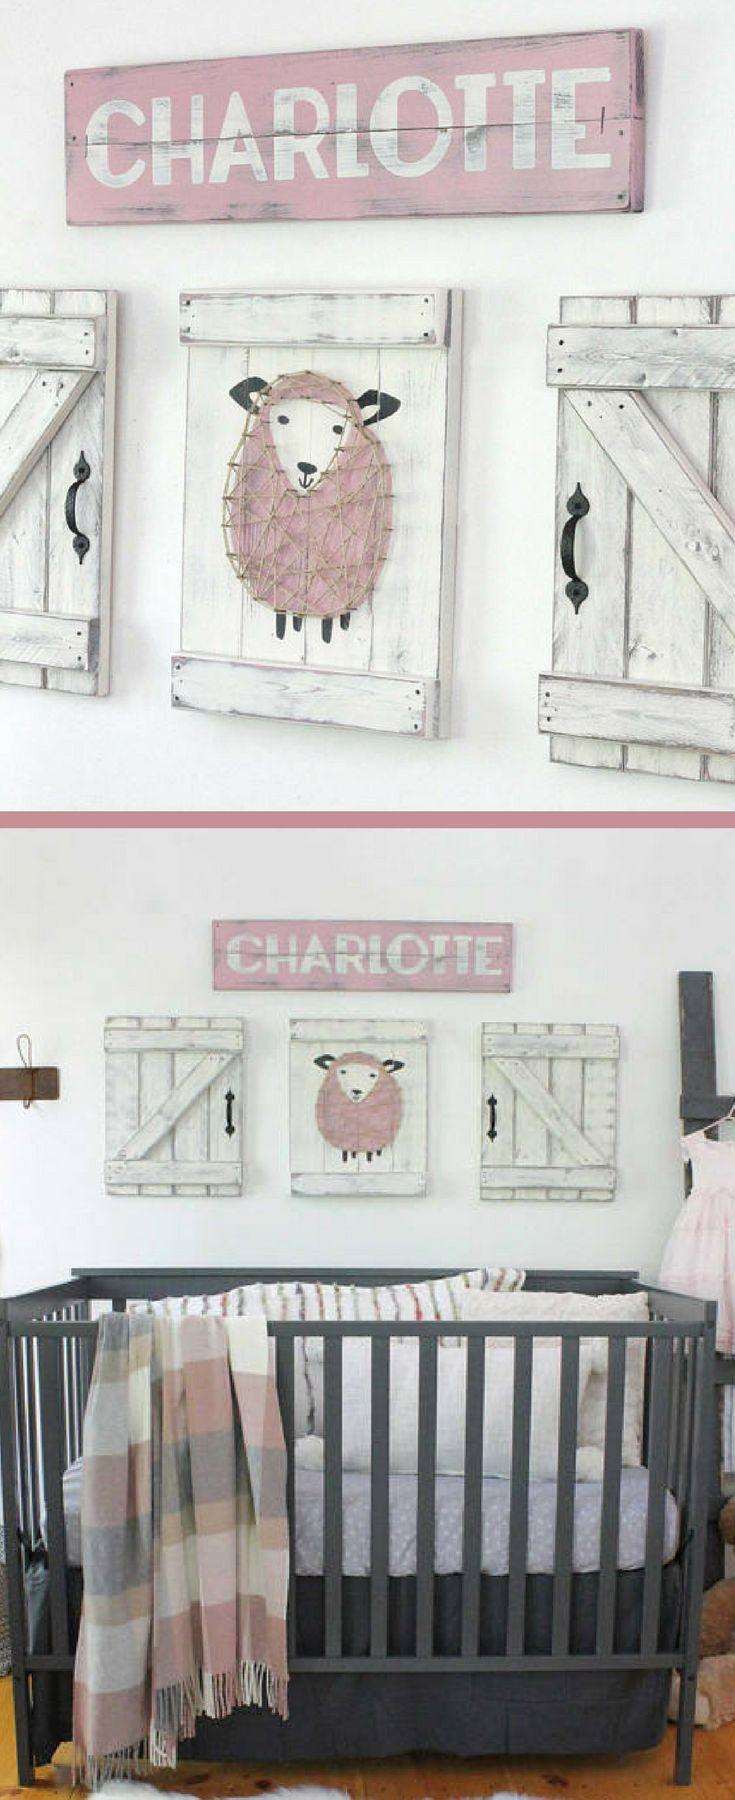 SHEEP NURSERY DECOR, 3 pc. set, lamb nursery art, rustic sheep decor, above the crib wall decor, rustic girl nursery, rustic nursery decor, farmhouse nursery decor, rustic sign, farmhouse sign, home decor, sheep nursery wall art #ad